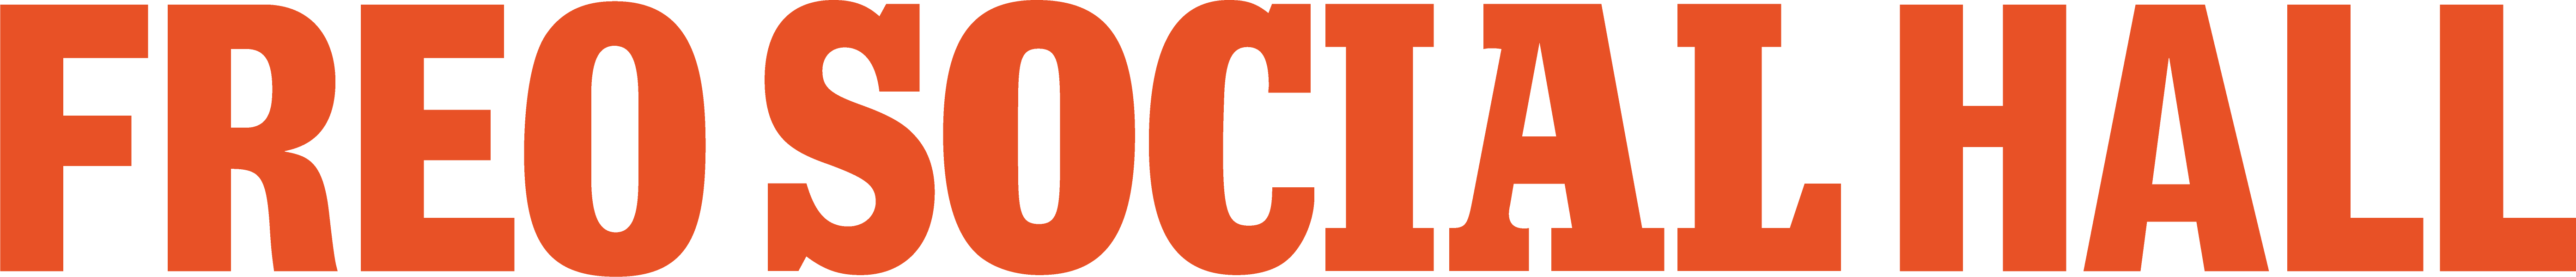 freo-social-hall-logo-orange